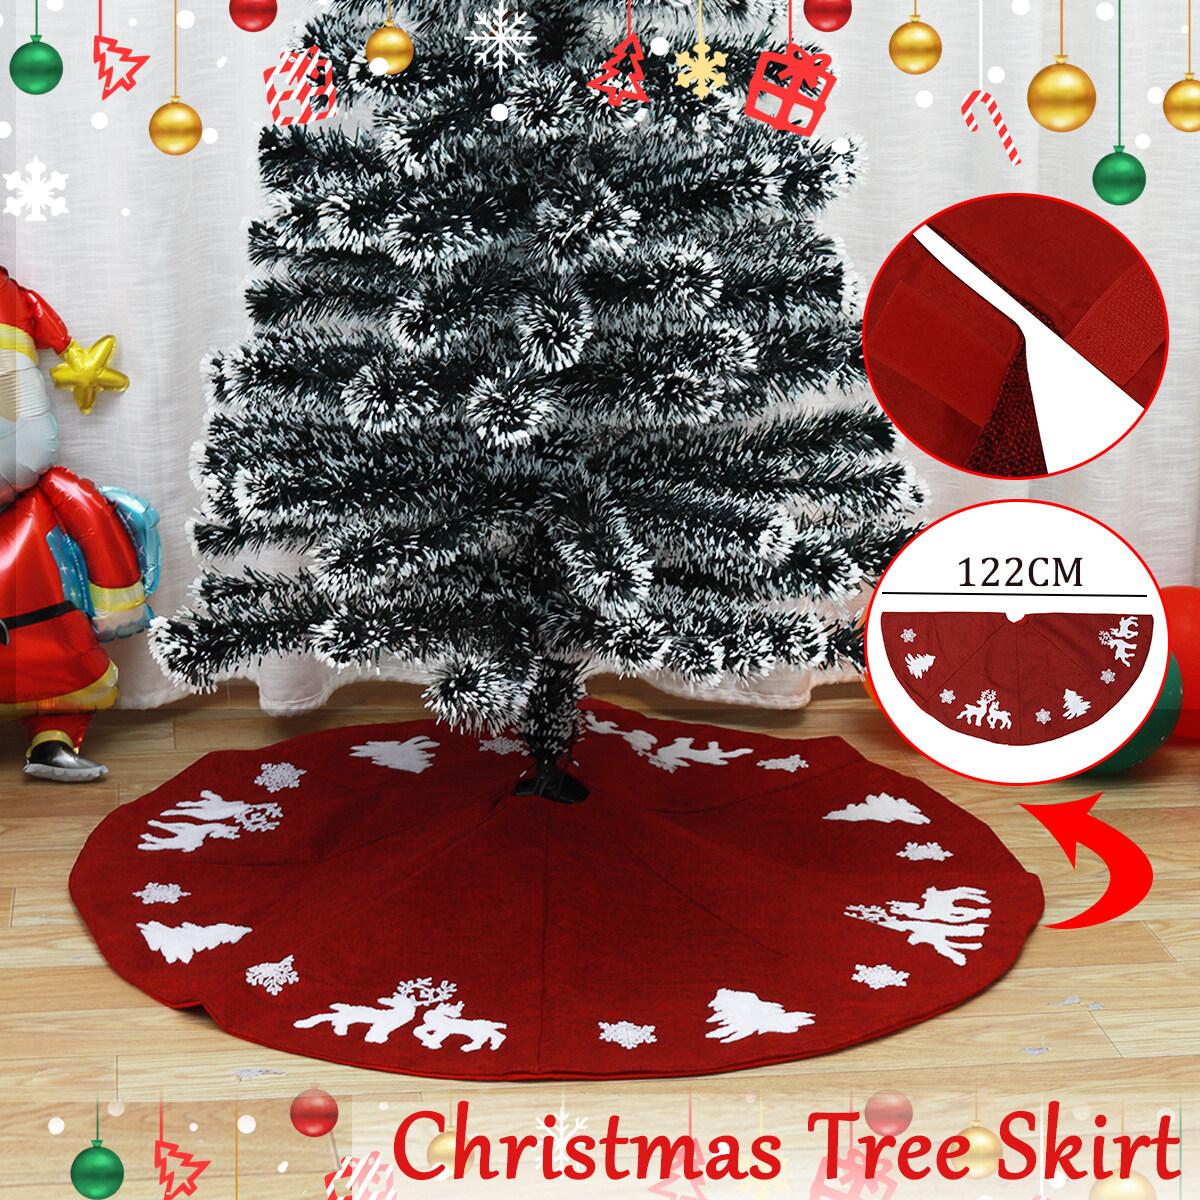 48 Red Black Plaid Christmas Tree Skirts Home Hotel Christmas Party Decoration Lazada Singapore